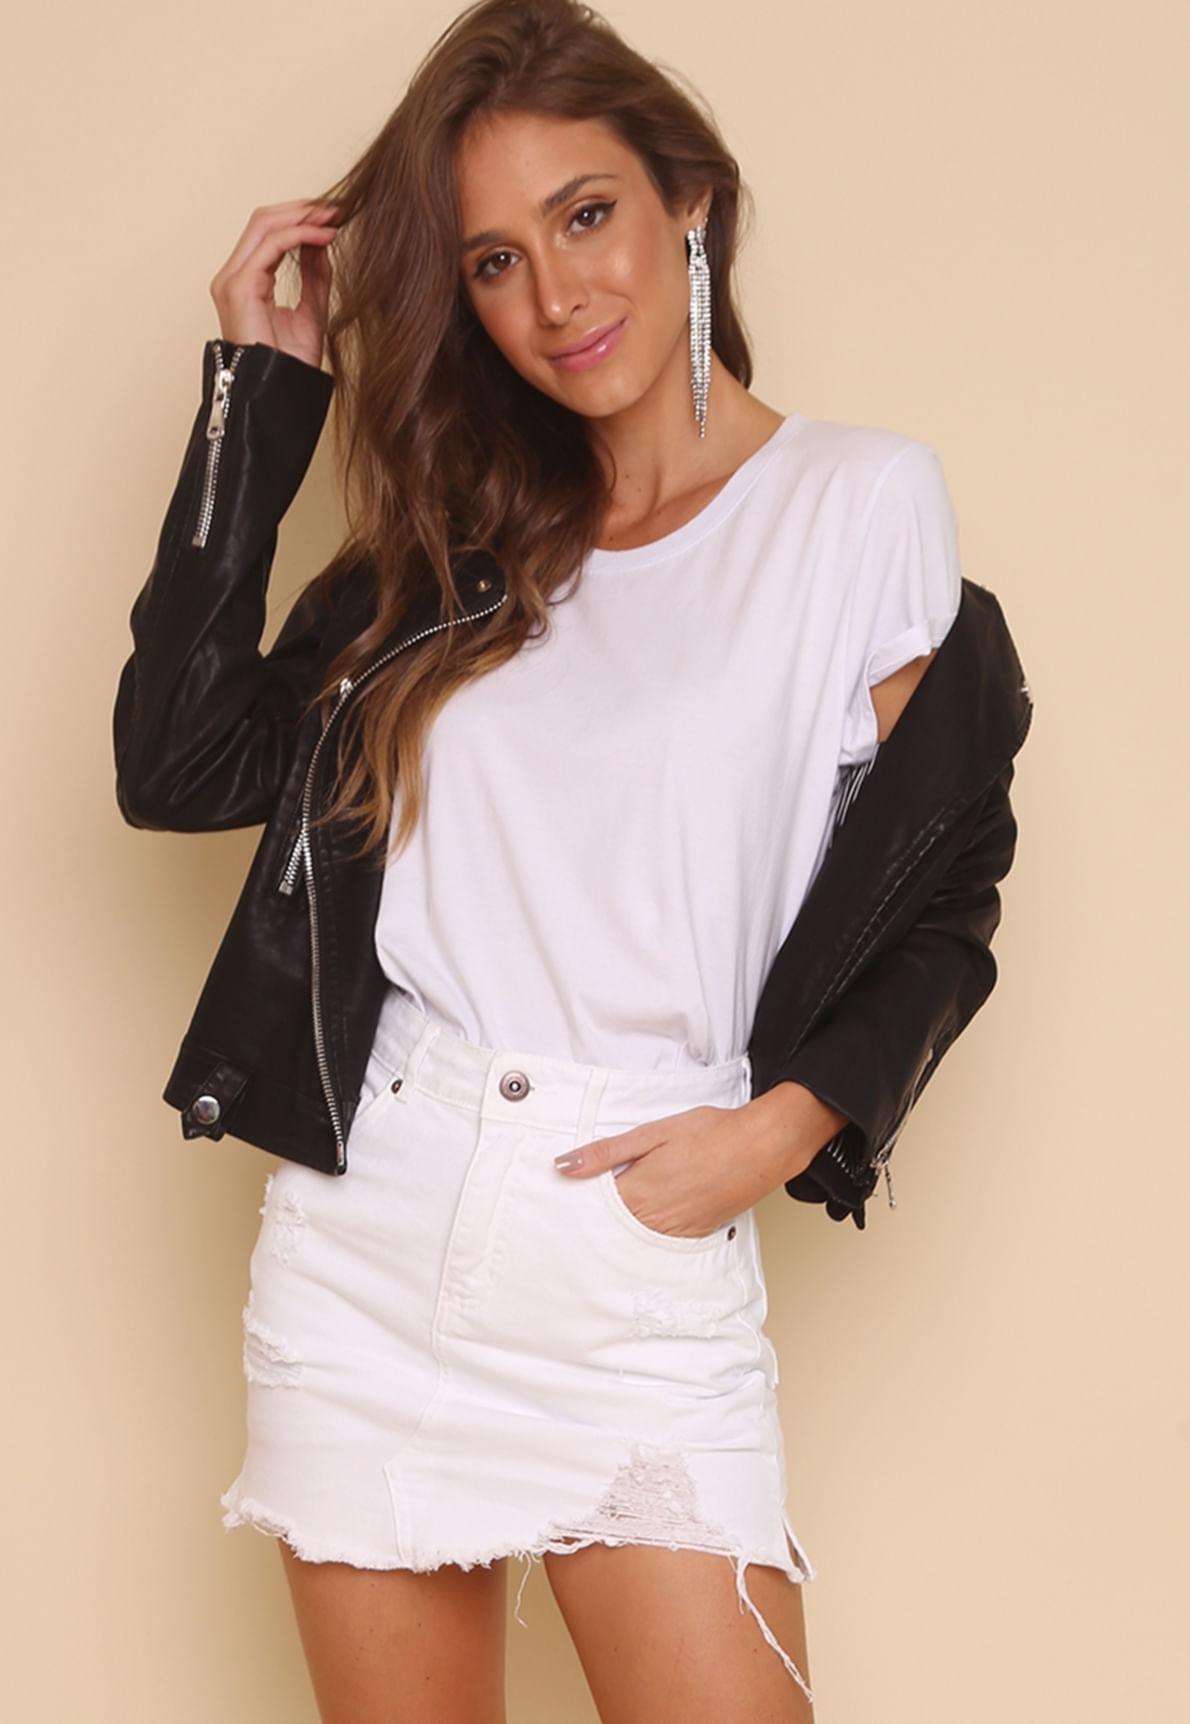 17709-t-shirt-basica-branca-lolita-pop-mundo-lolita-03